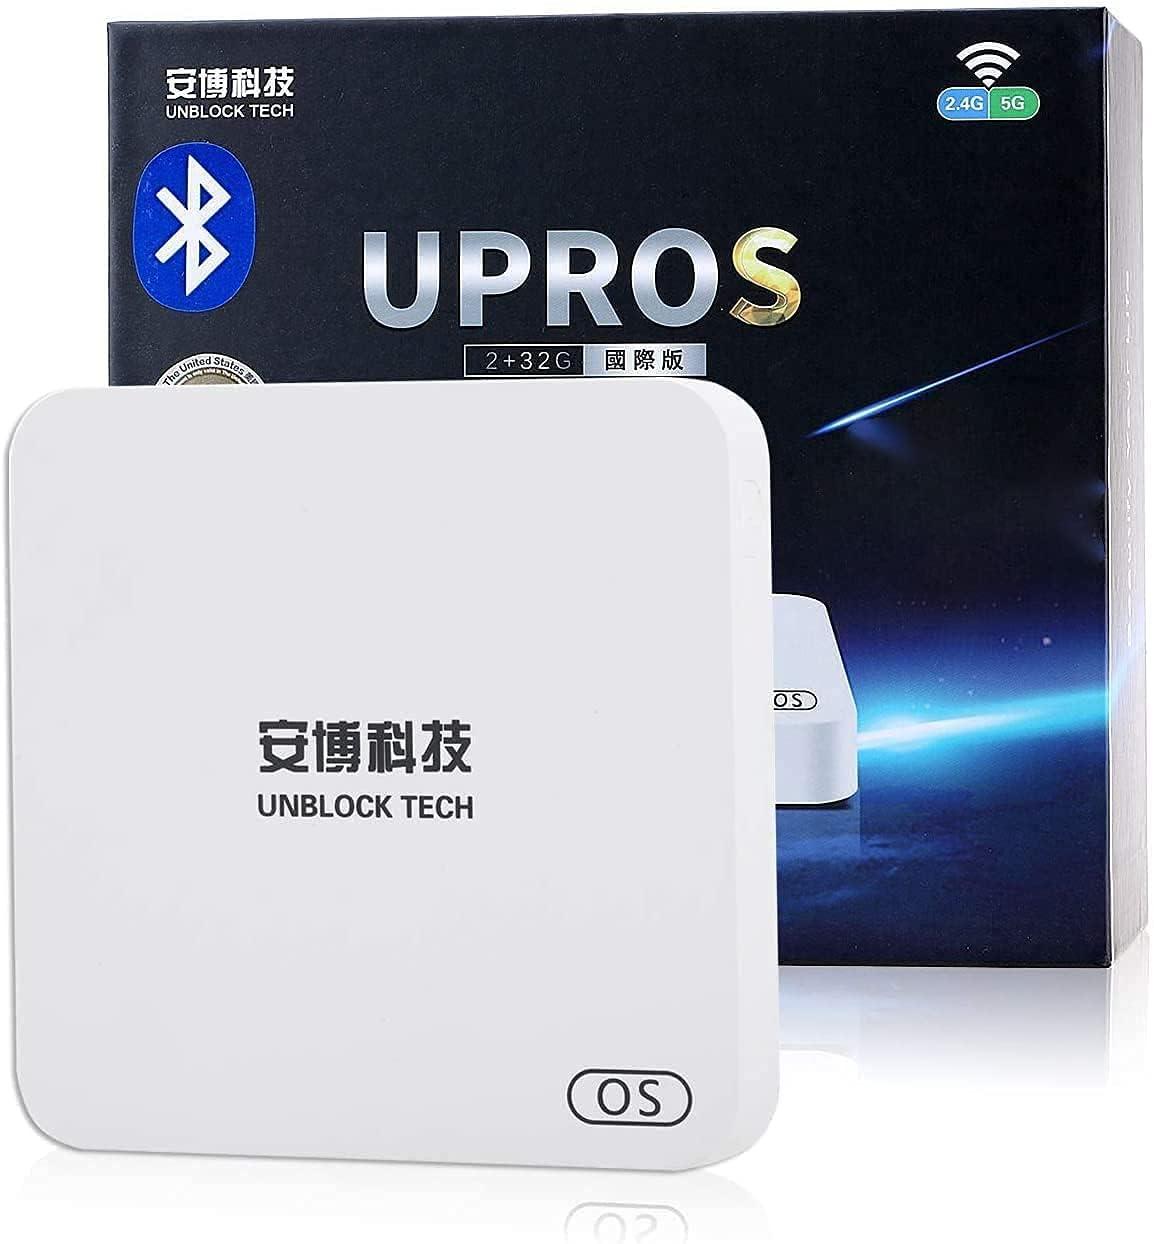 Chinese TV Box 2021 2GB RAM 32GB ROM ANBO7 安博 Android White Color 1000K+ Mainland Hong Kong Taiwan Macao Mandarin Cantonese